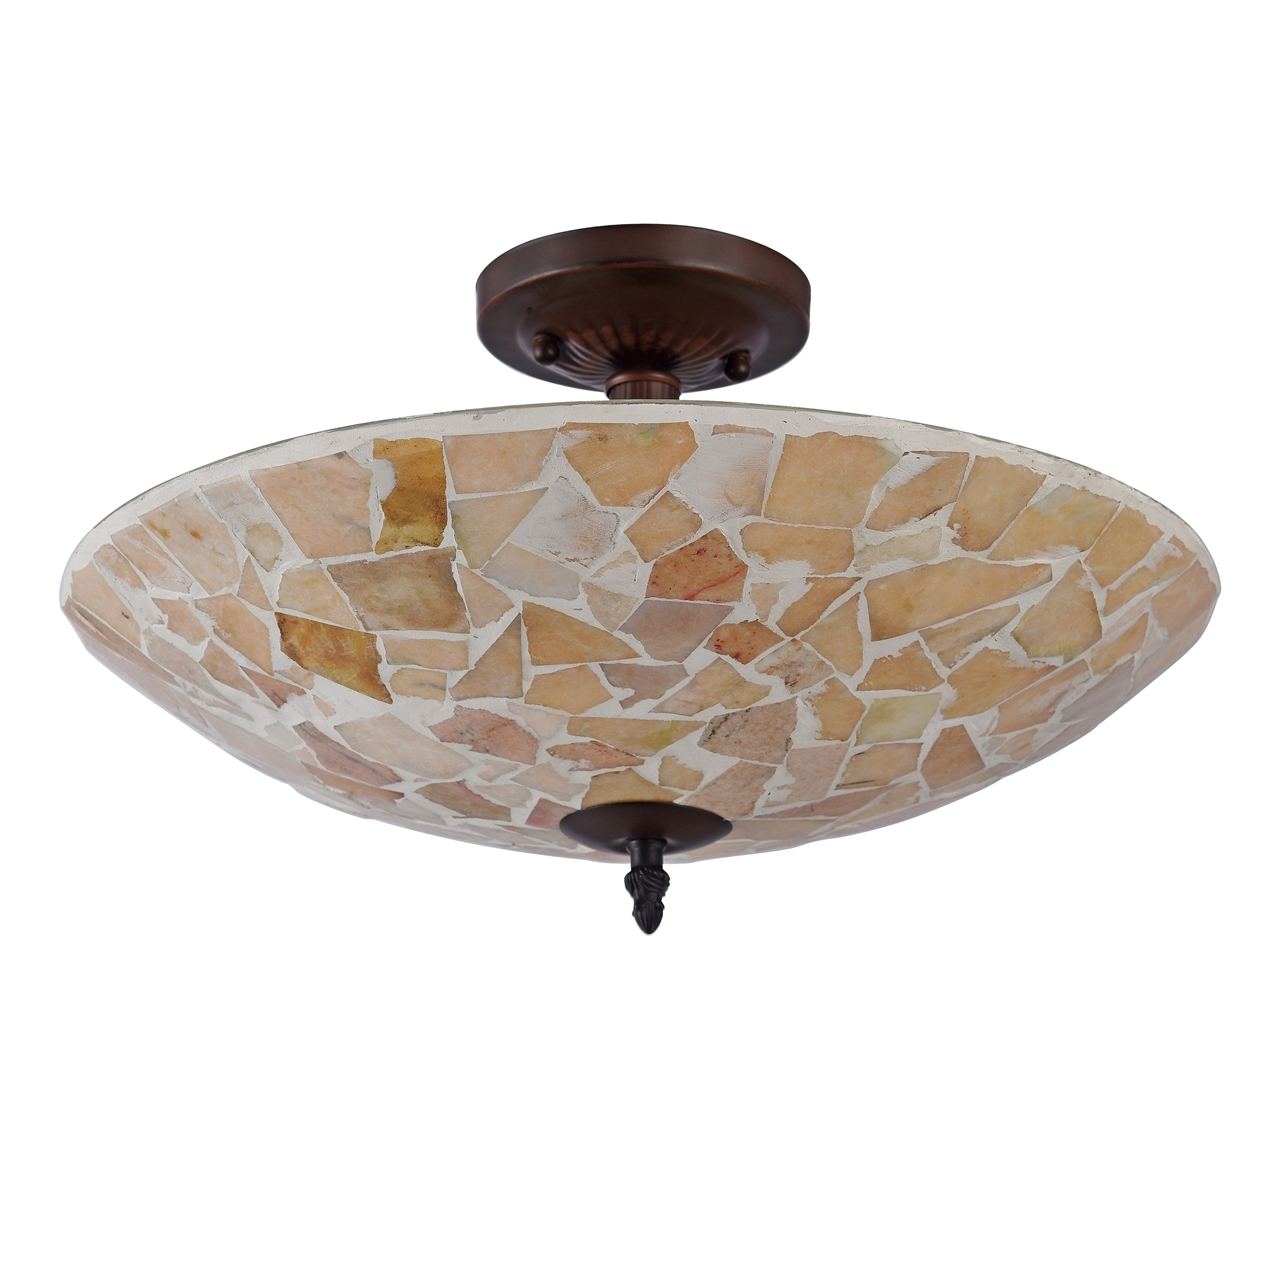 Conical 16 Drum Semi Flush Fixture In 2019: CHLOE Lighting, Inc CH3C003AM16-UF2 Semi-flush Ceiling Fixture